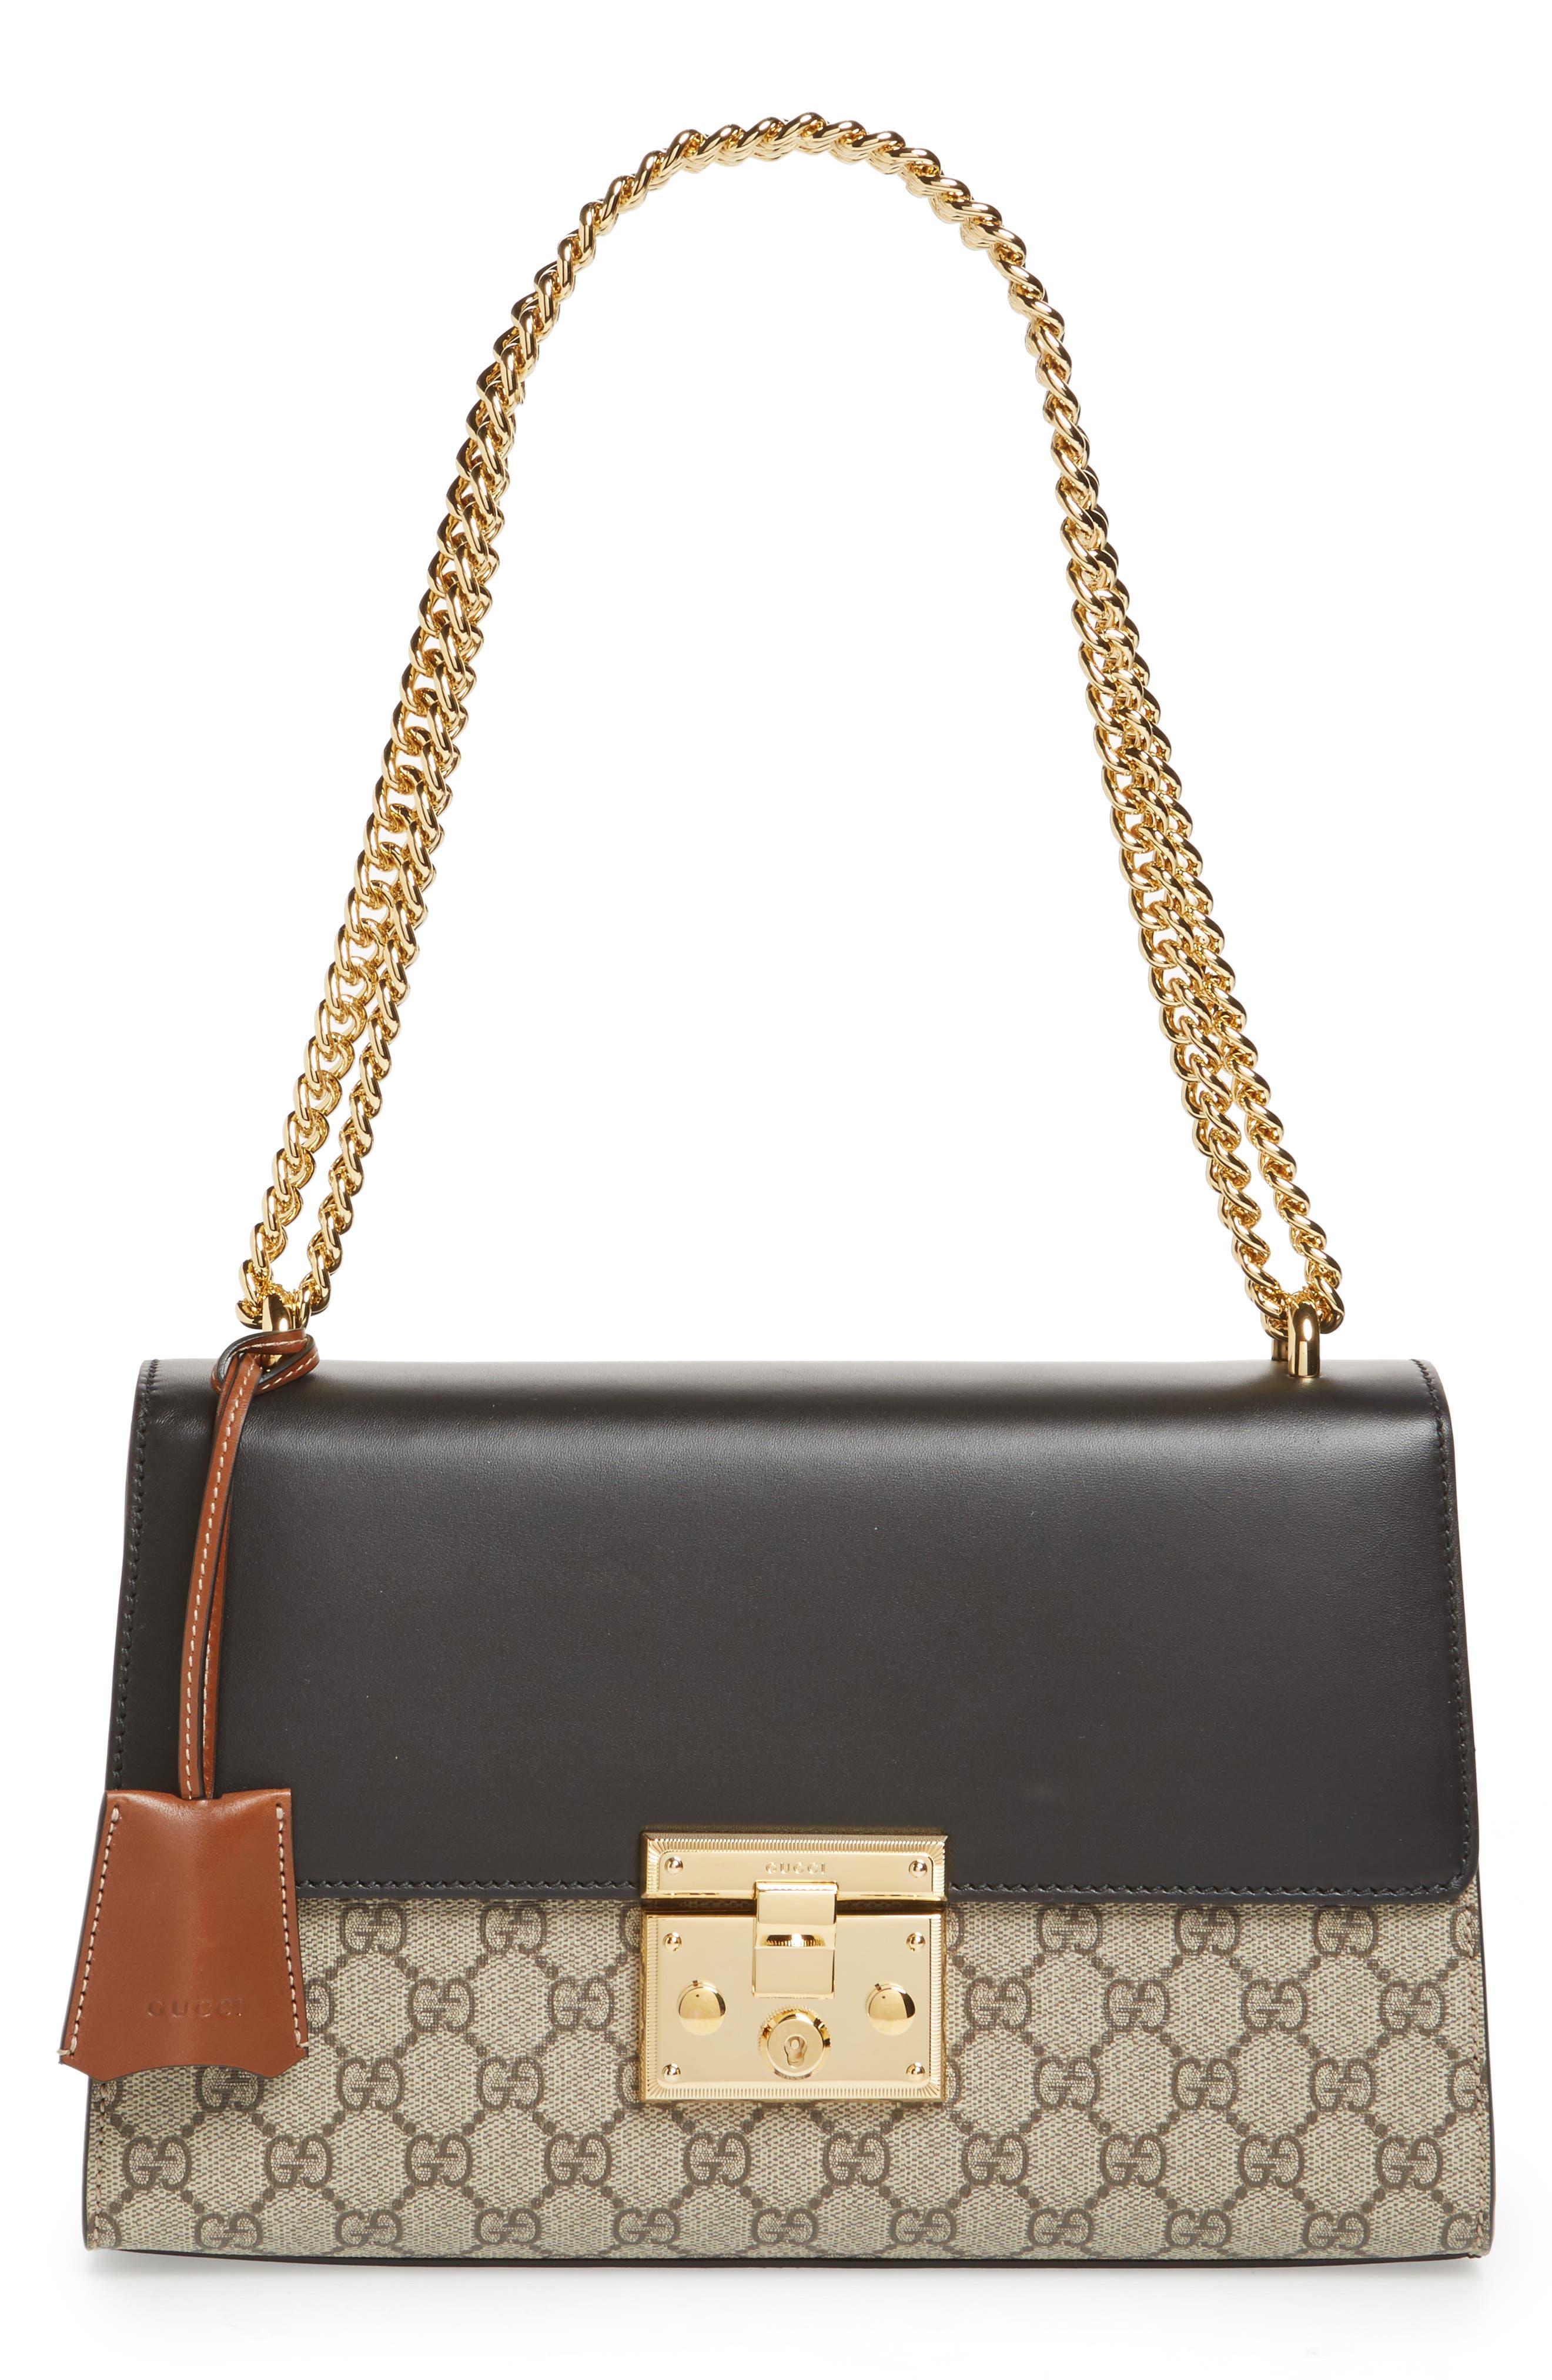 Medium Padlock Leather Shoulder Bag,                             Main thumbnail 1, color,                             MOON/ TOSCANO